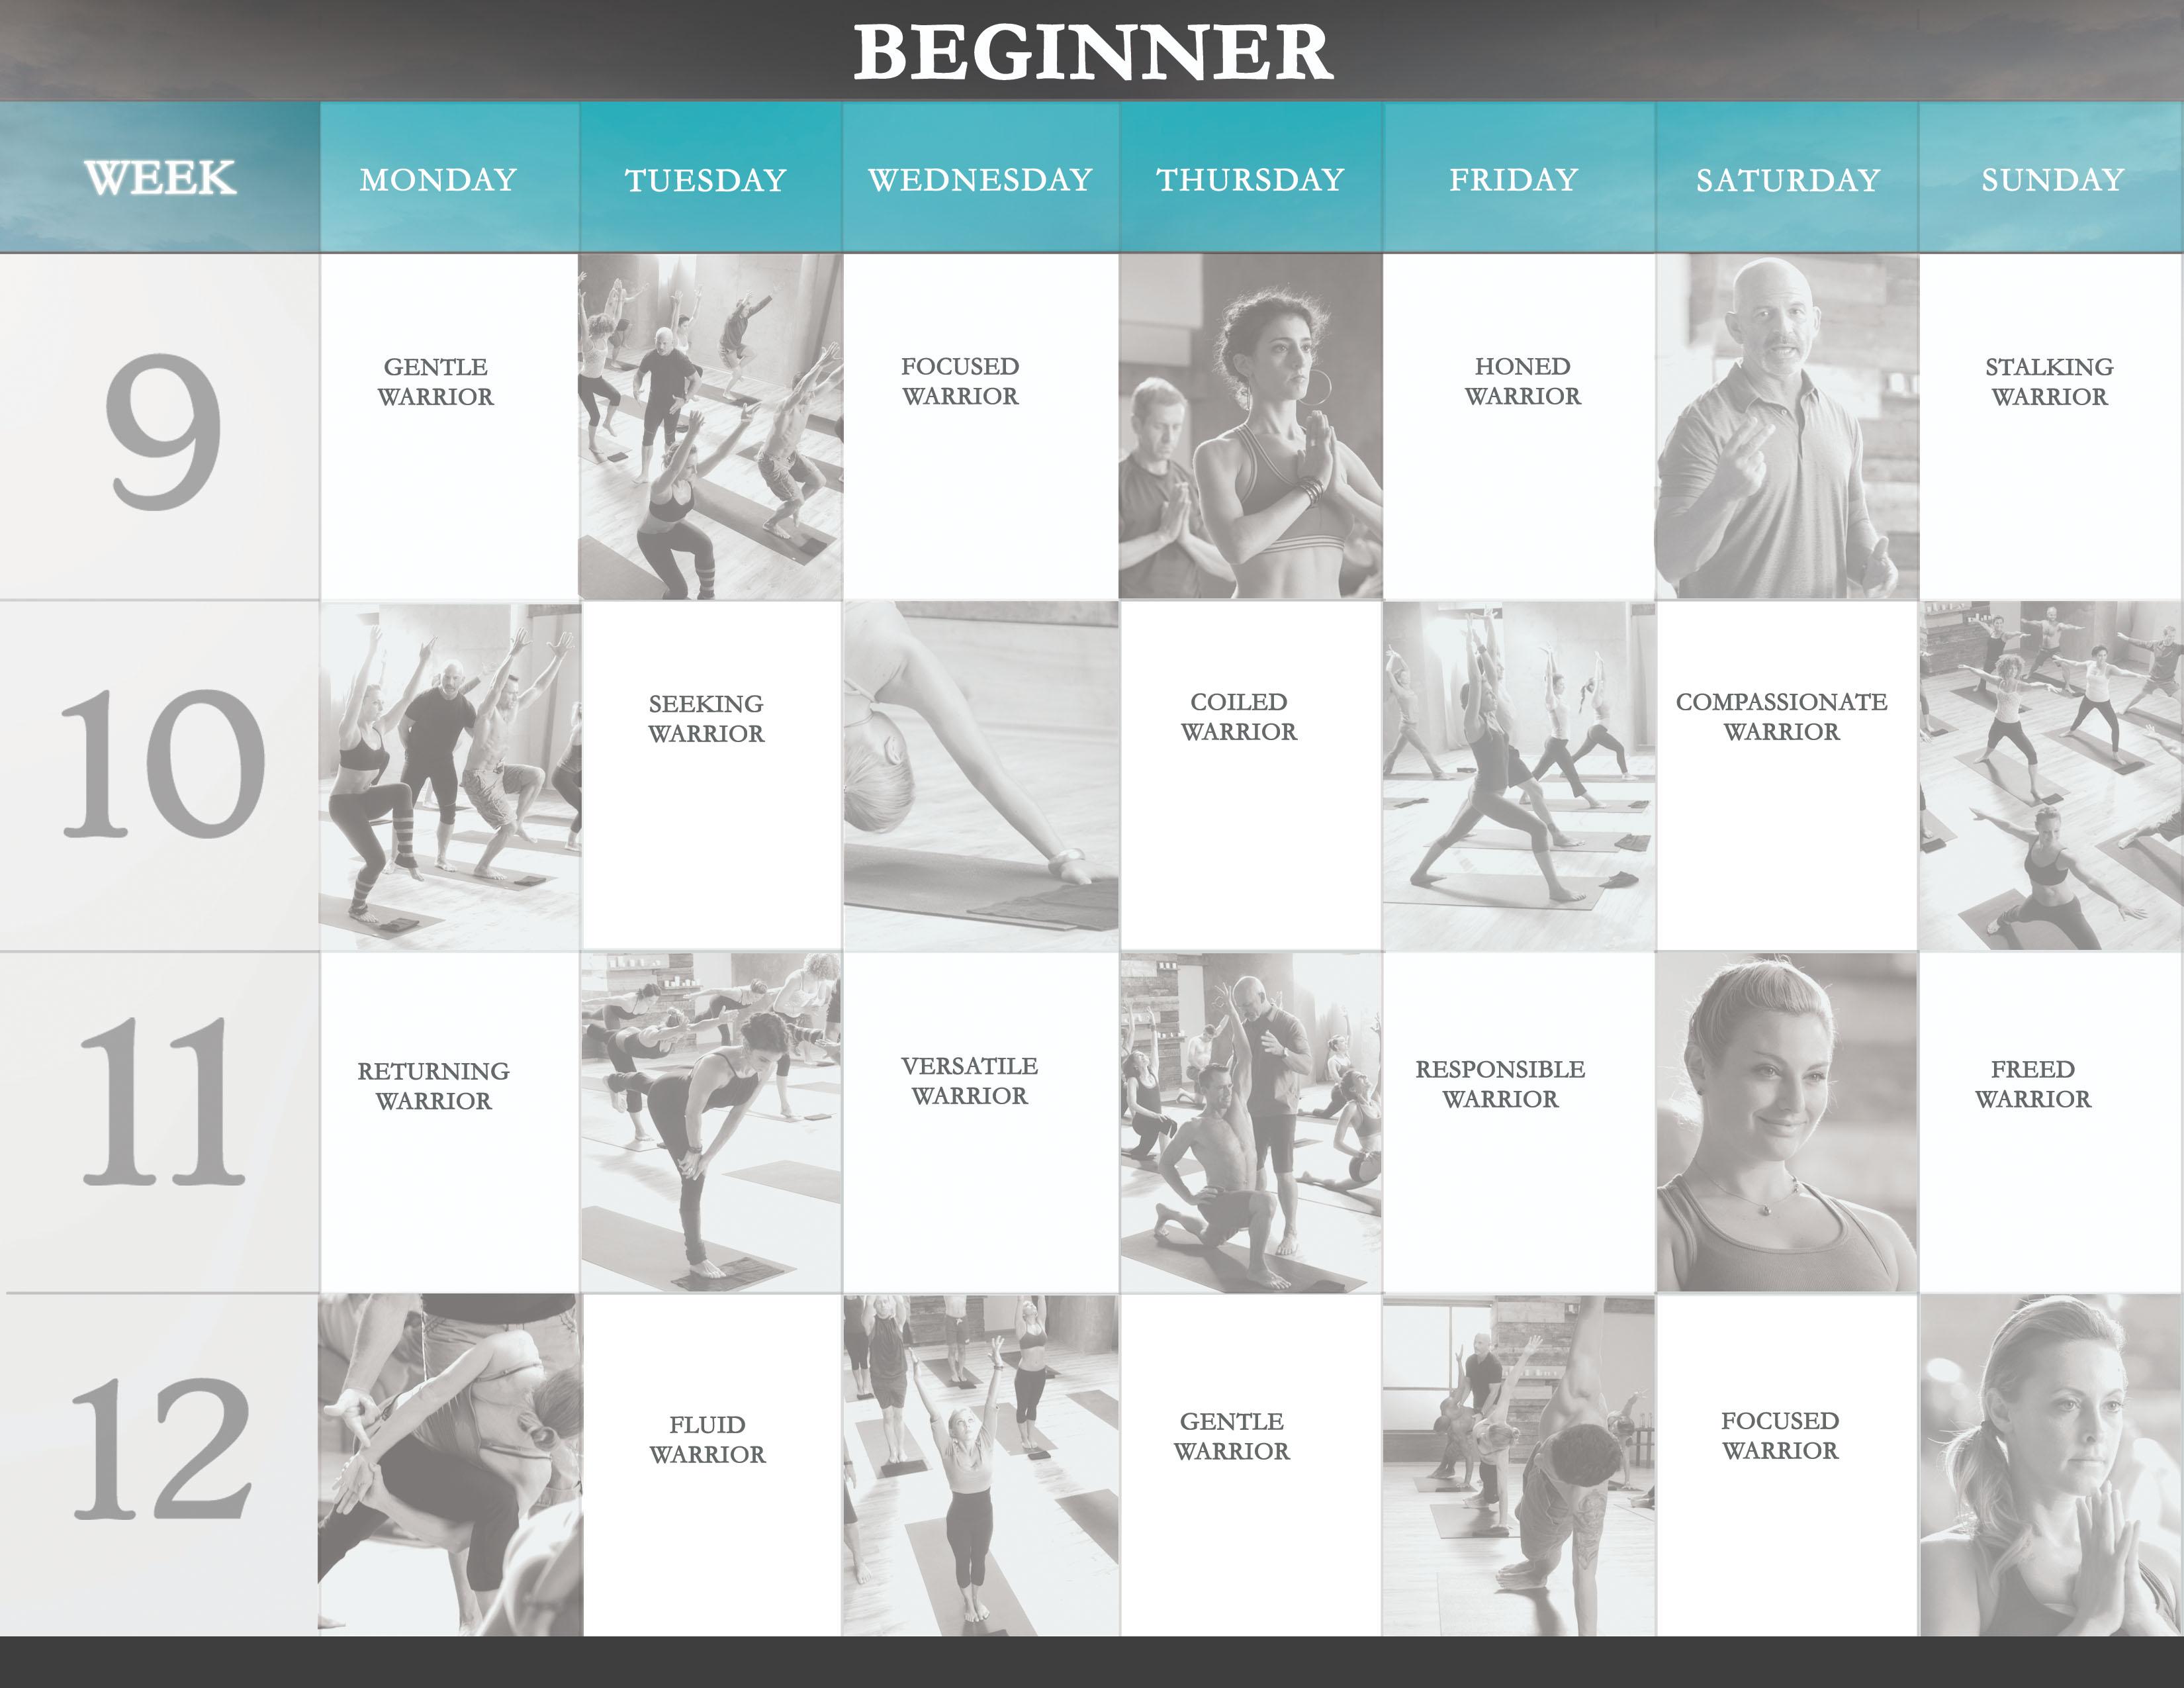 YW_beginner_cal-3